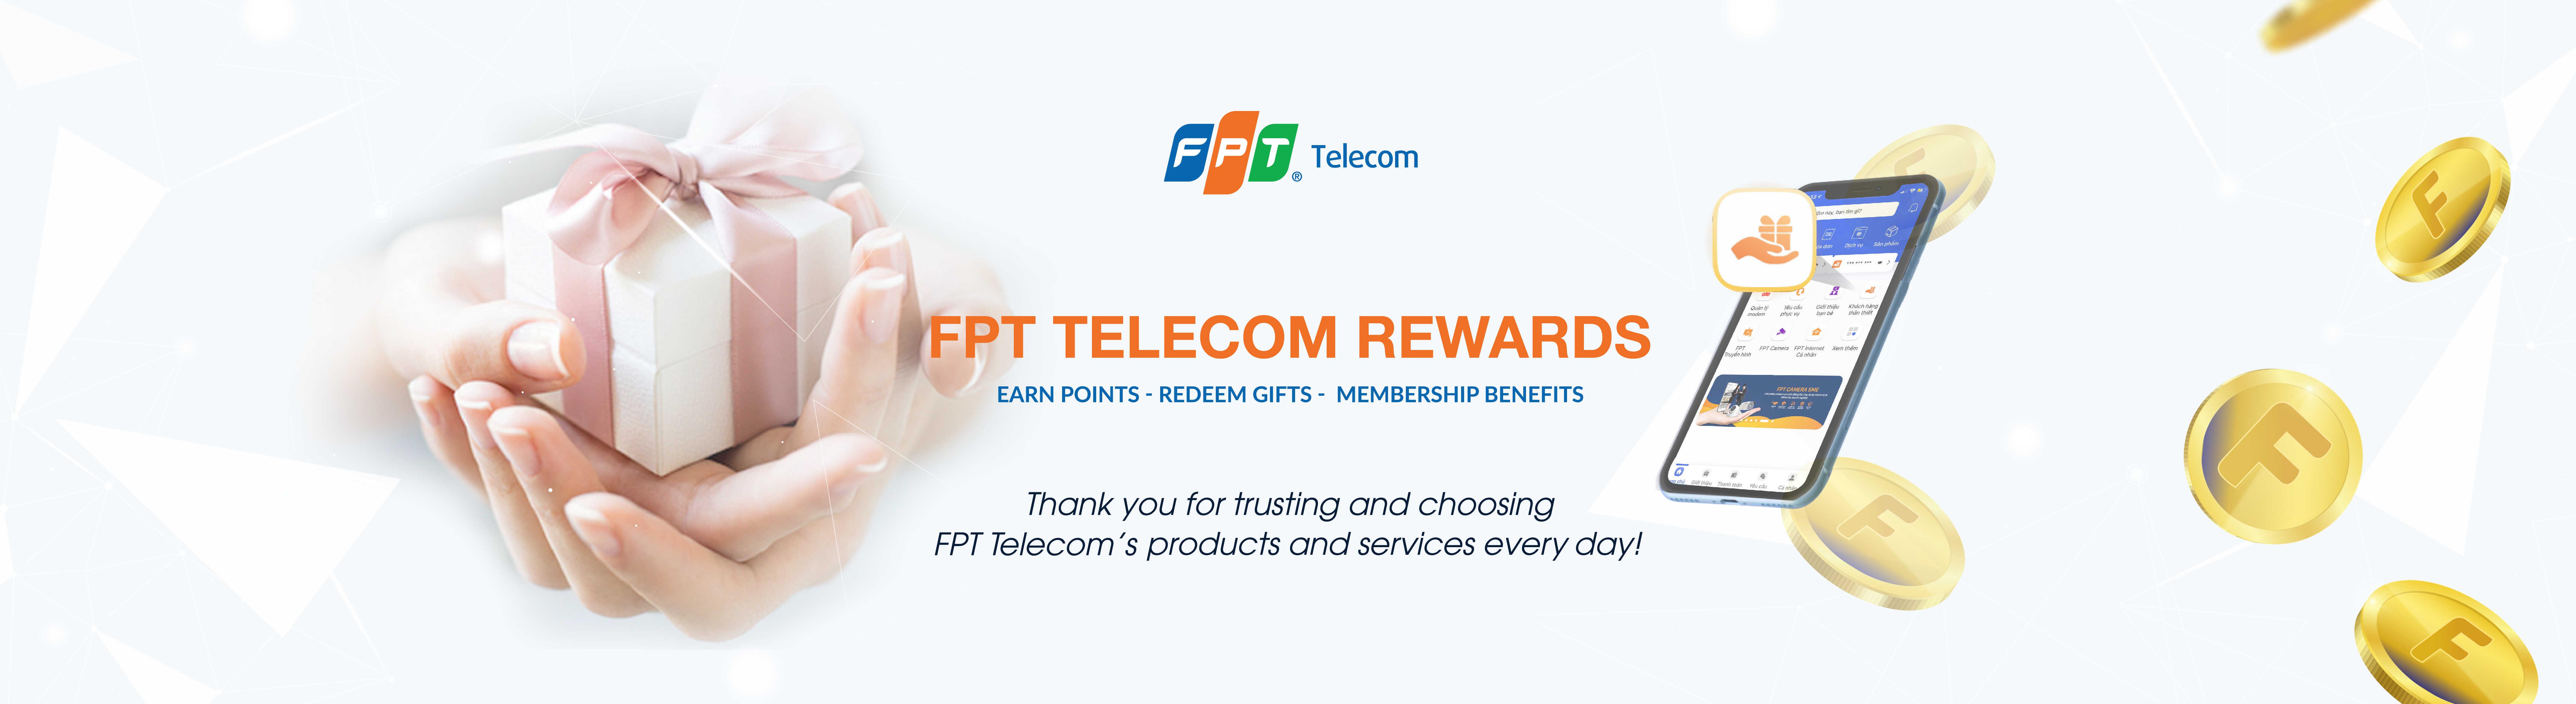 FPT Telecom Rewards